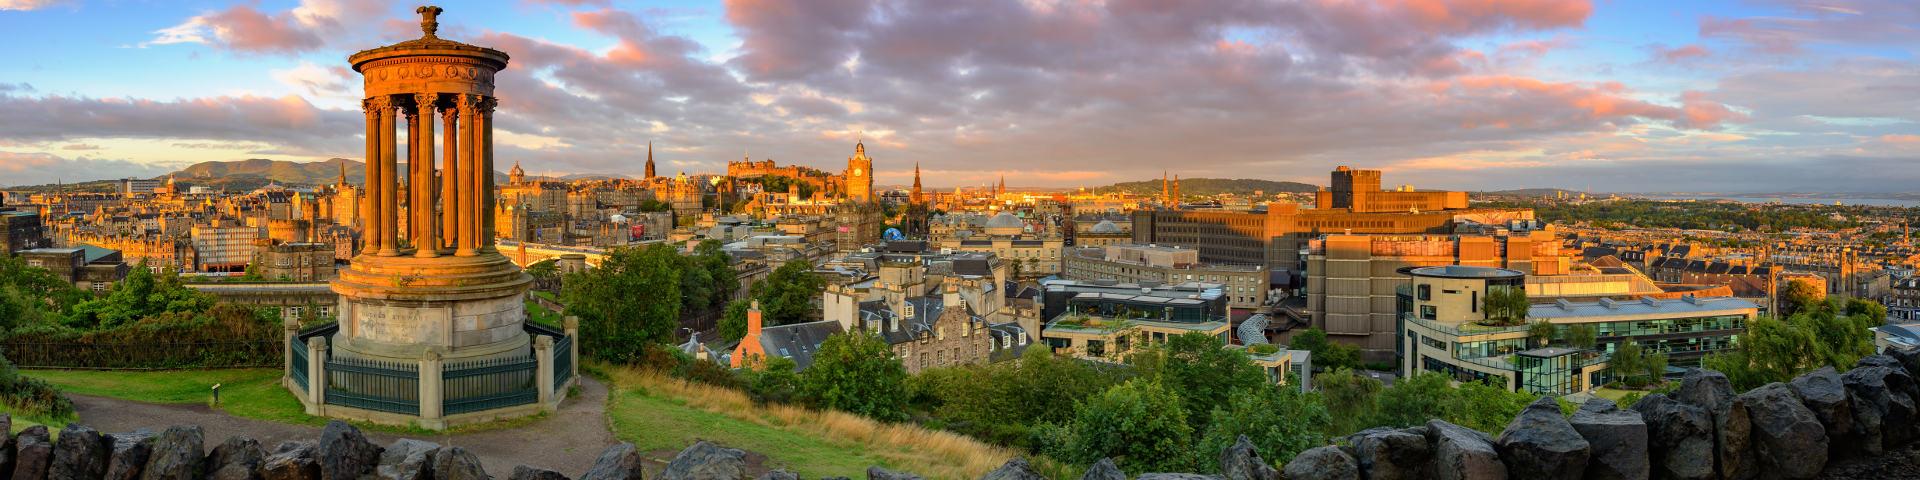 Edinburgh hero banner